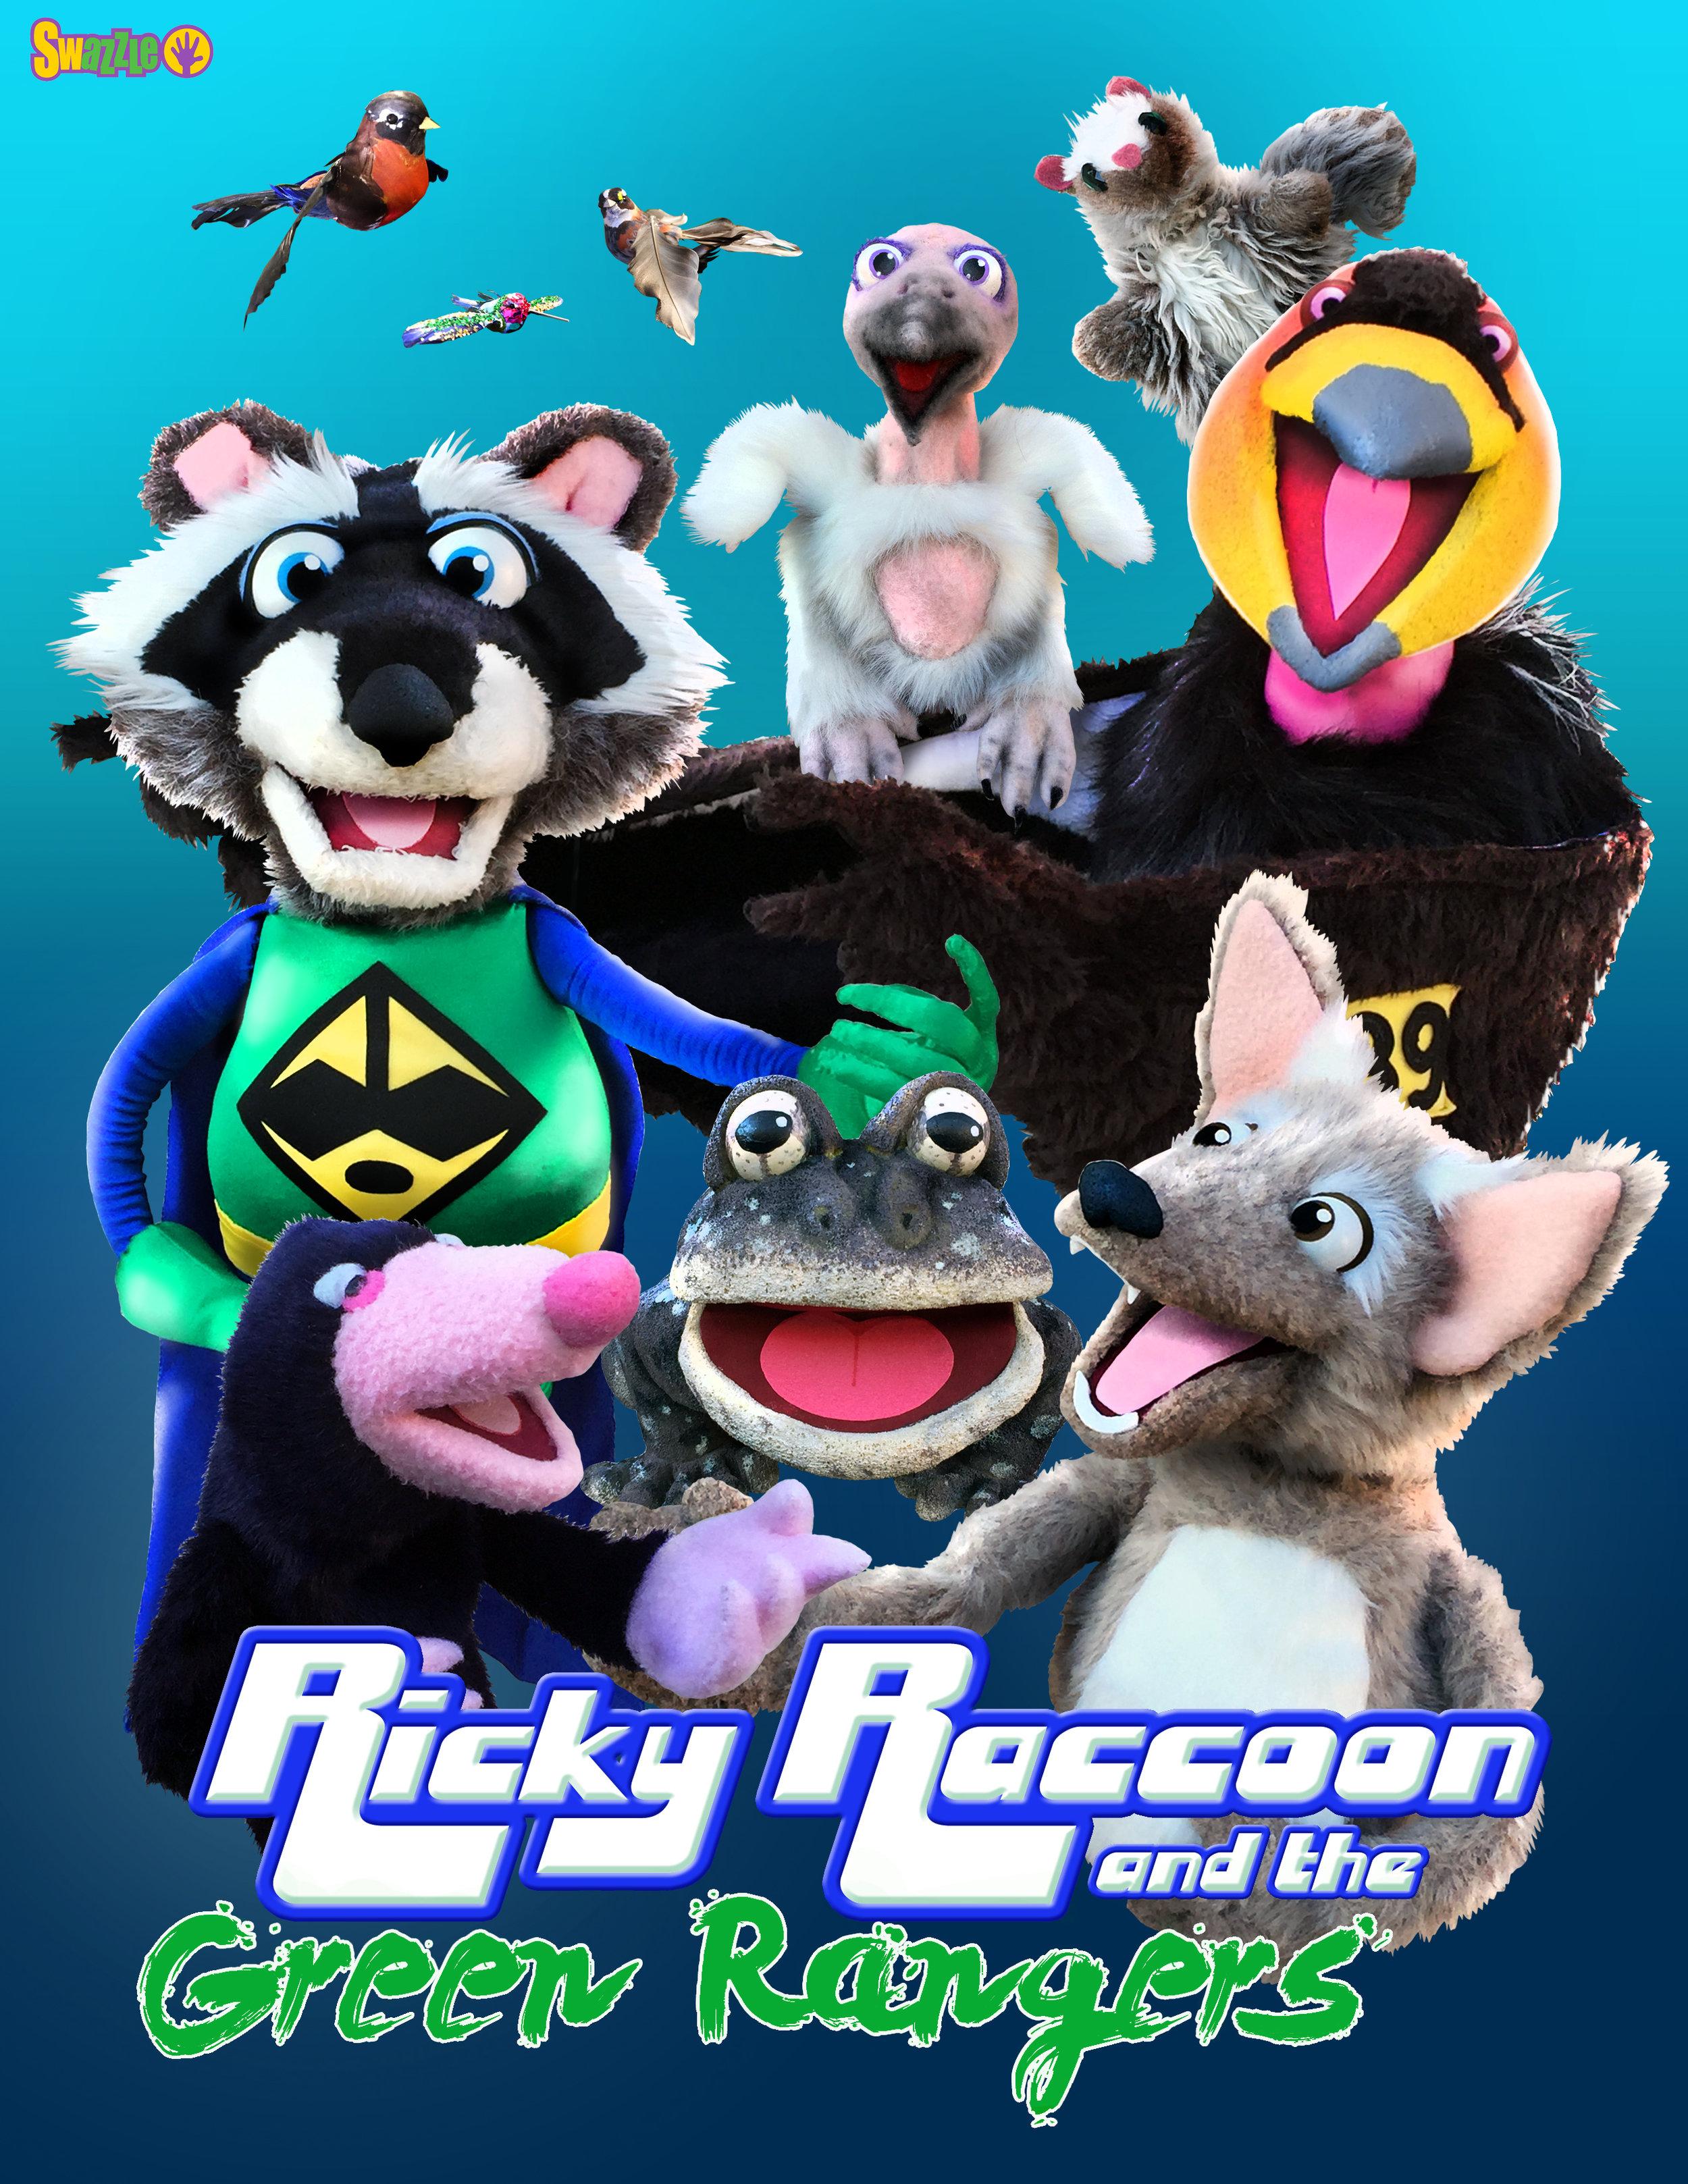 Ricky Raccoon zoo poster 2018.jpg